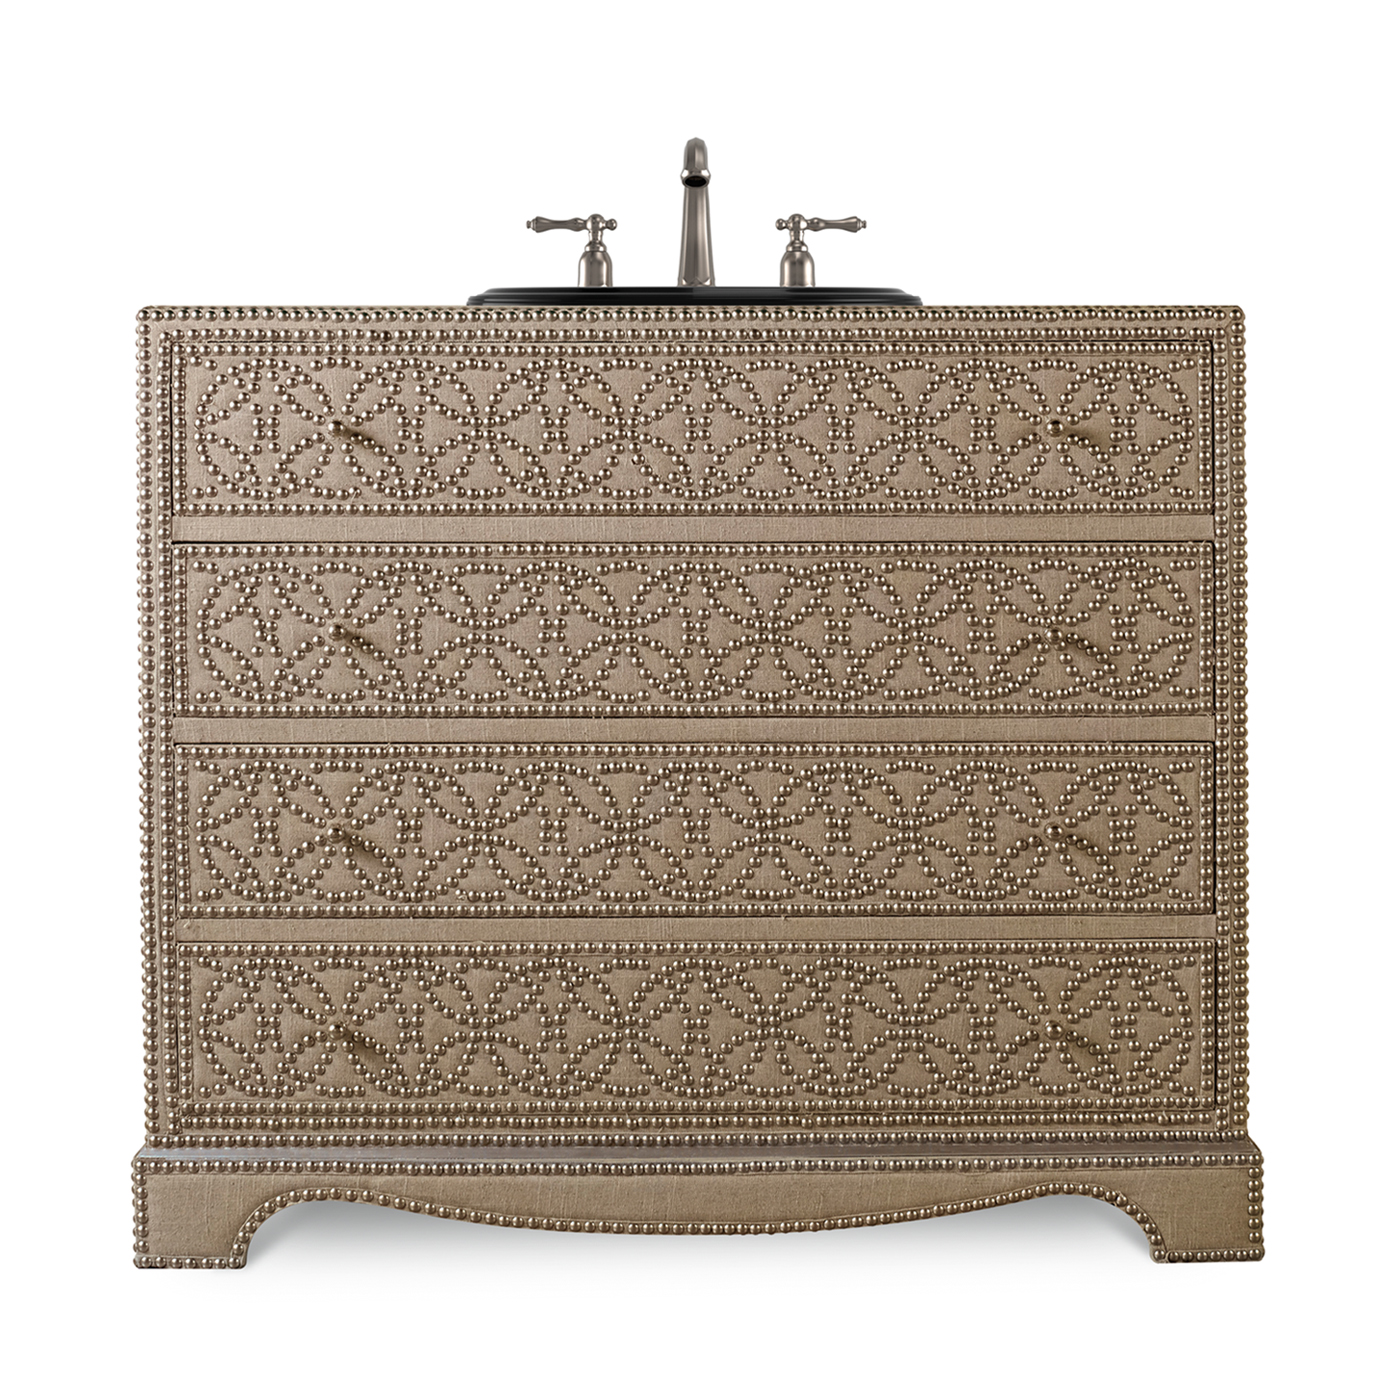 blaire 42 inch hall chest bathroom vanitycole & co. designer